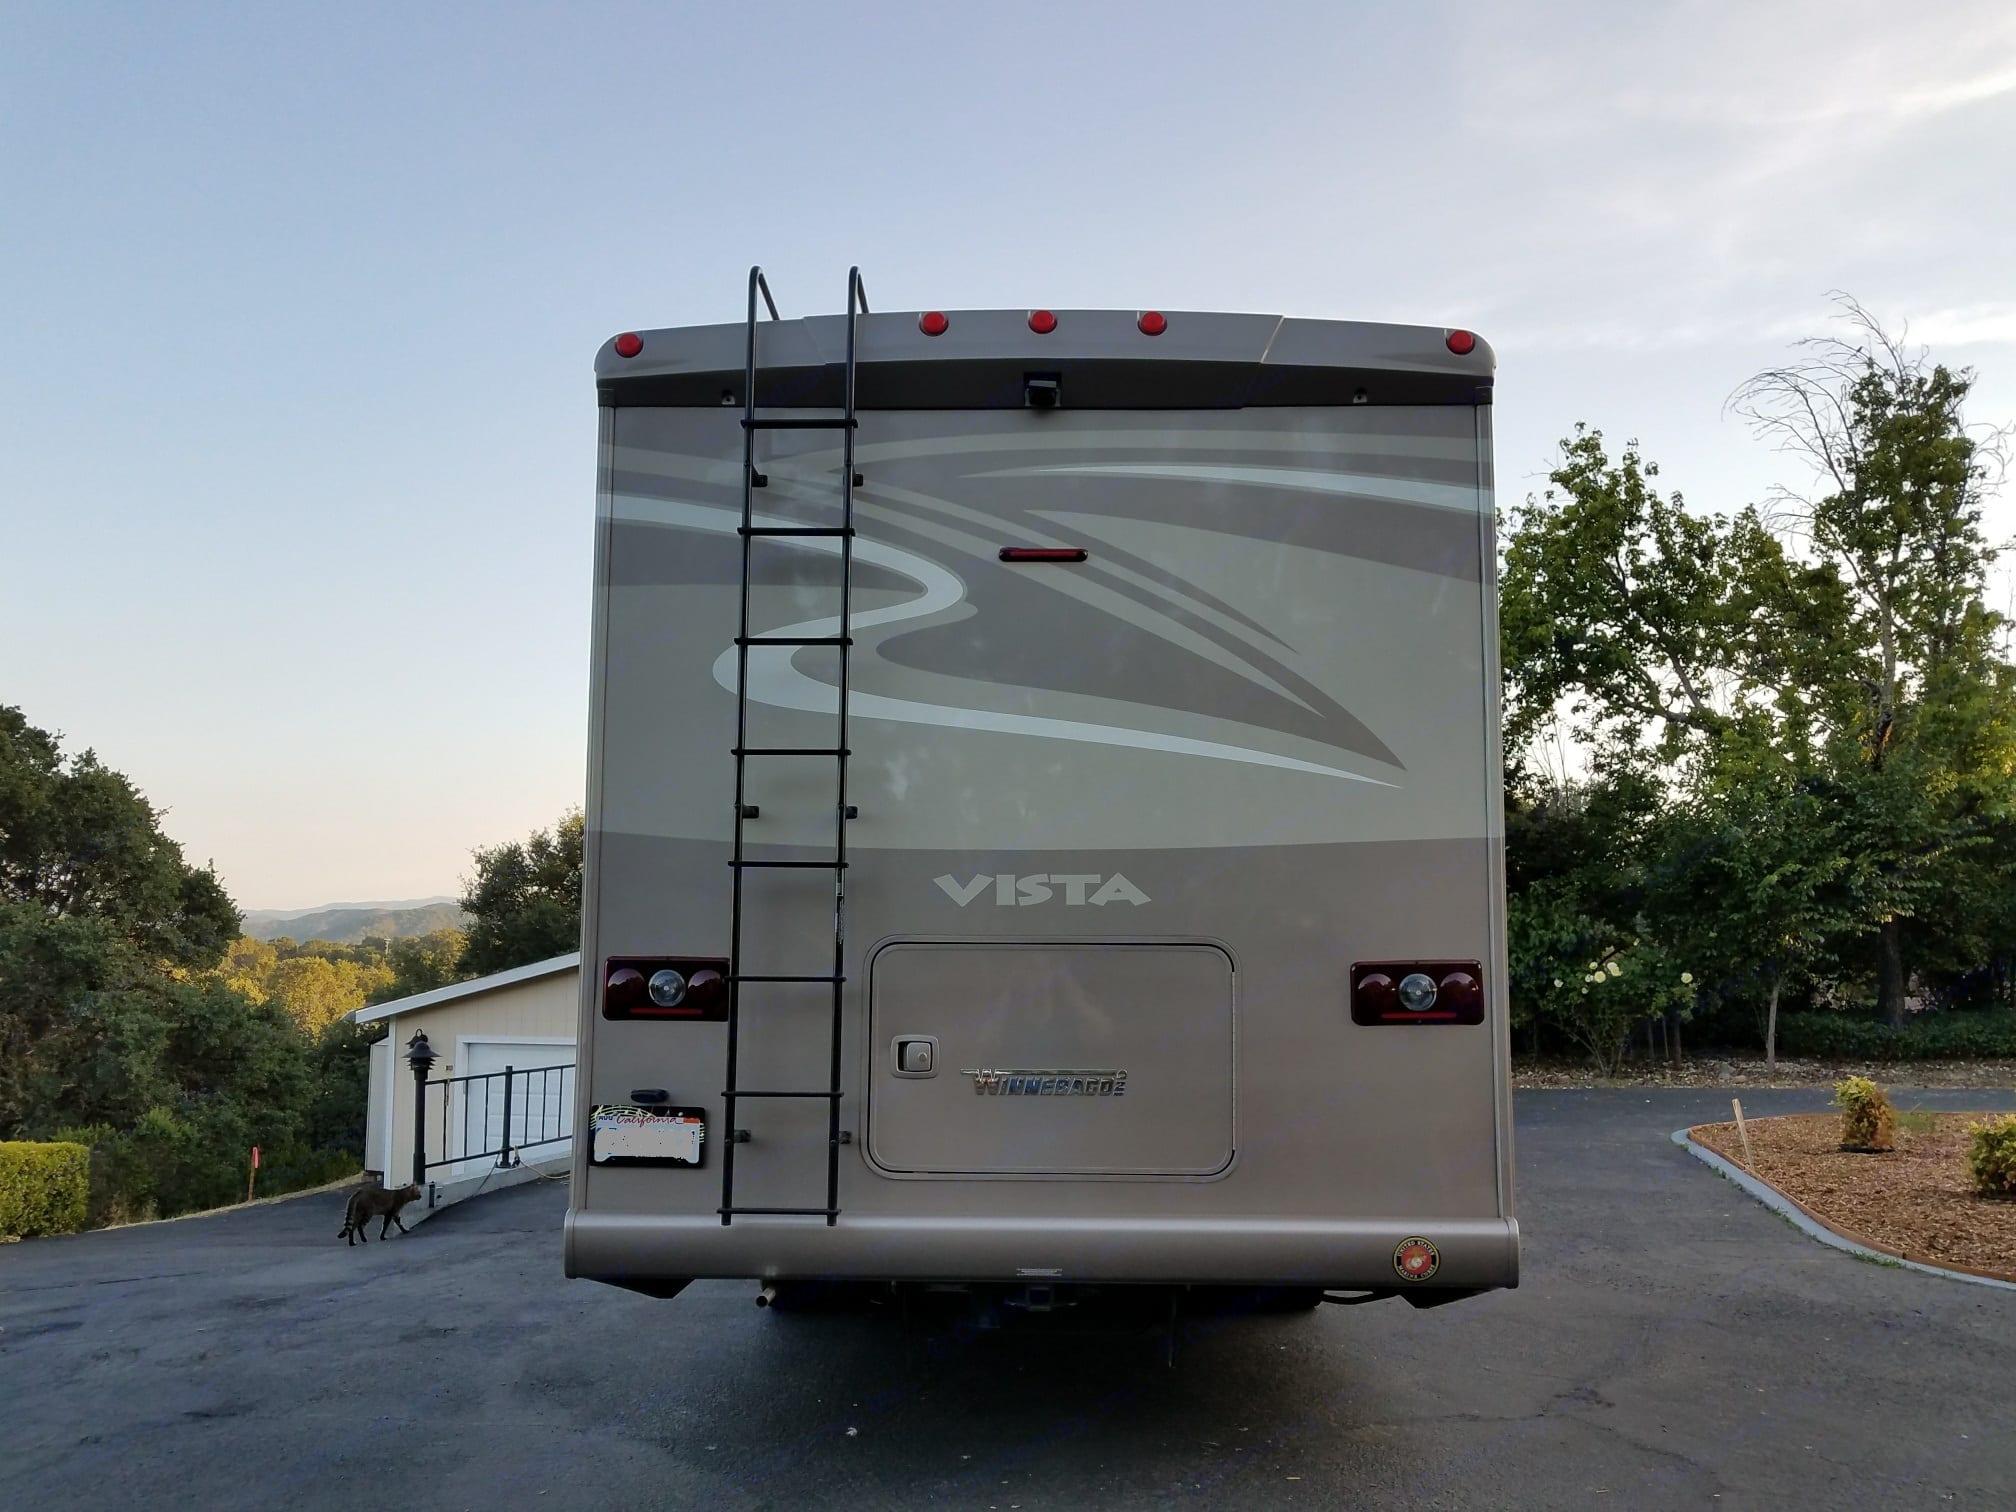 Rear view camera for backing safety. Winnebago Vista LX 2016